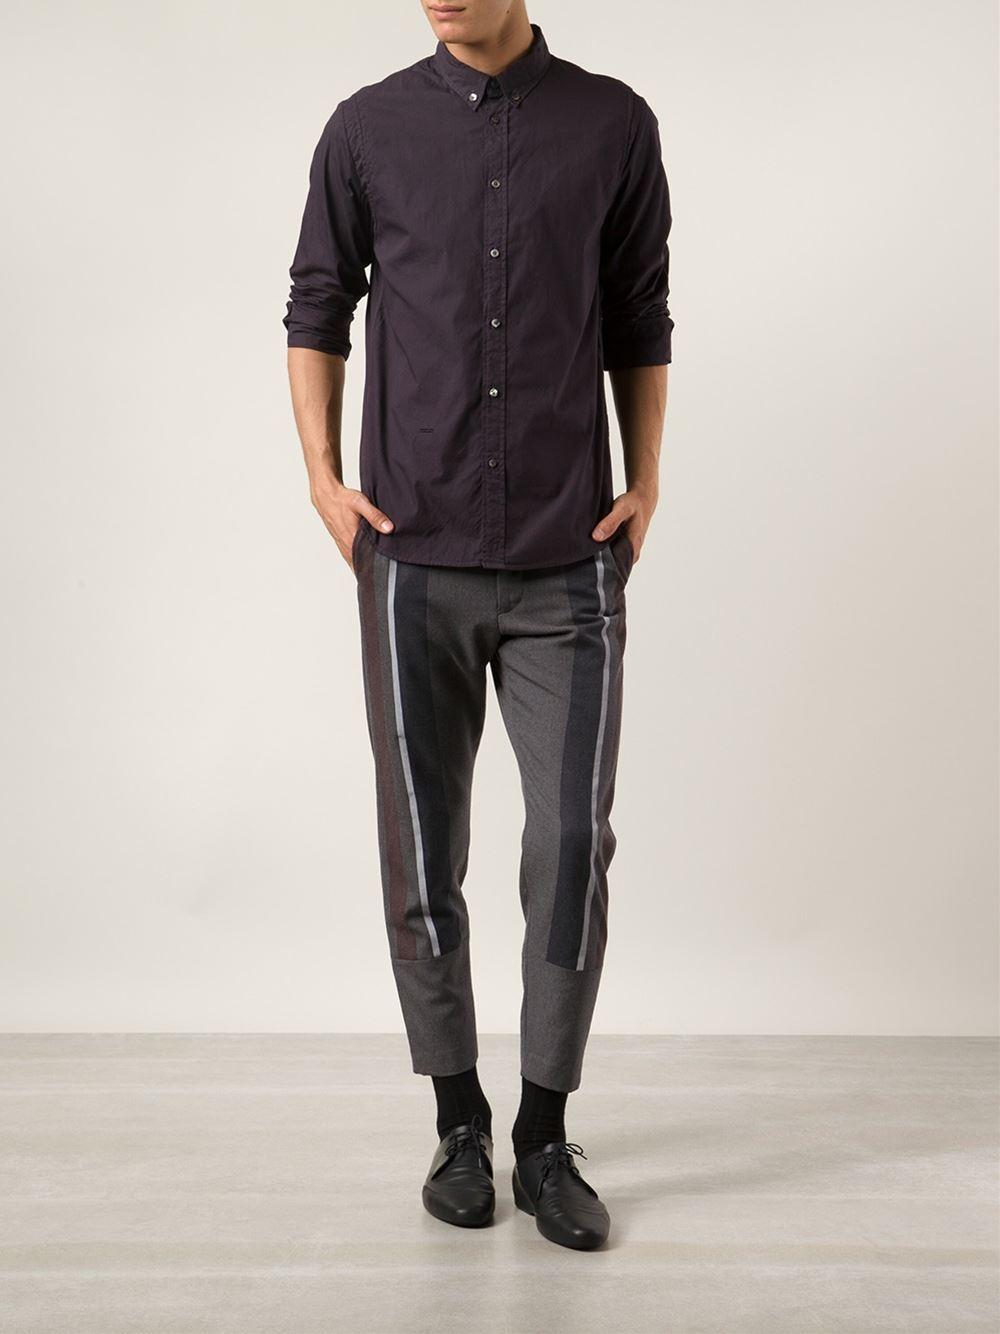 robert geller short trousers in gray for men lyst